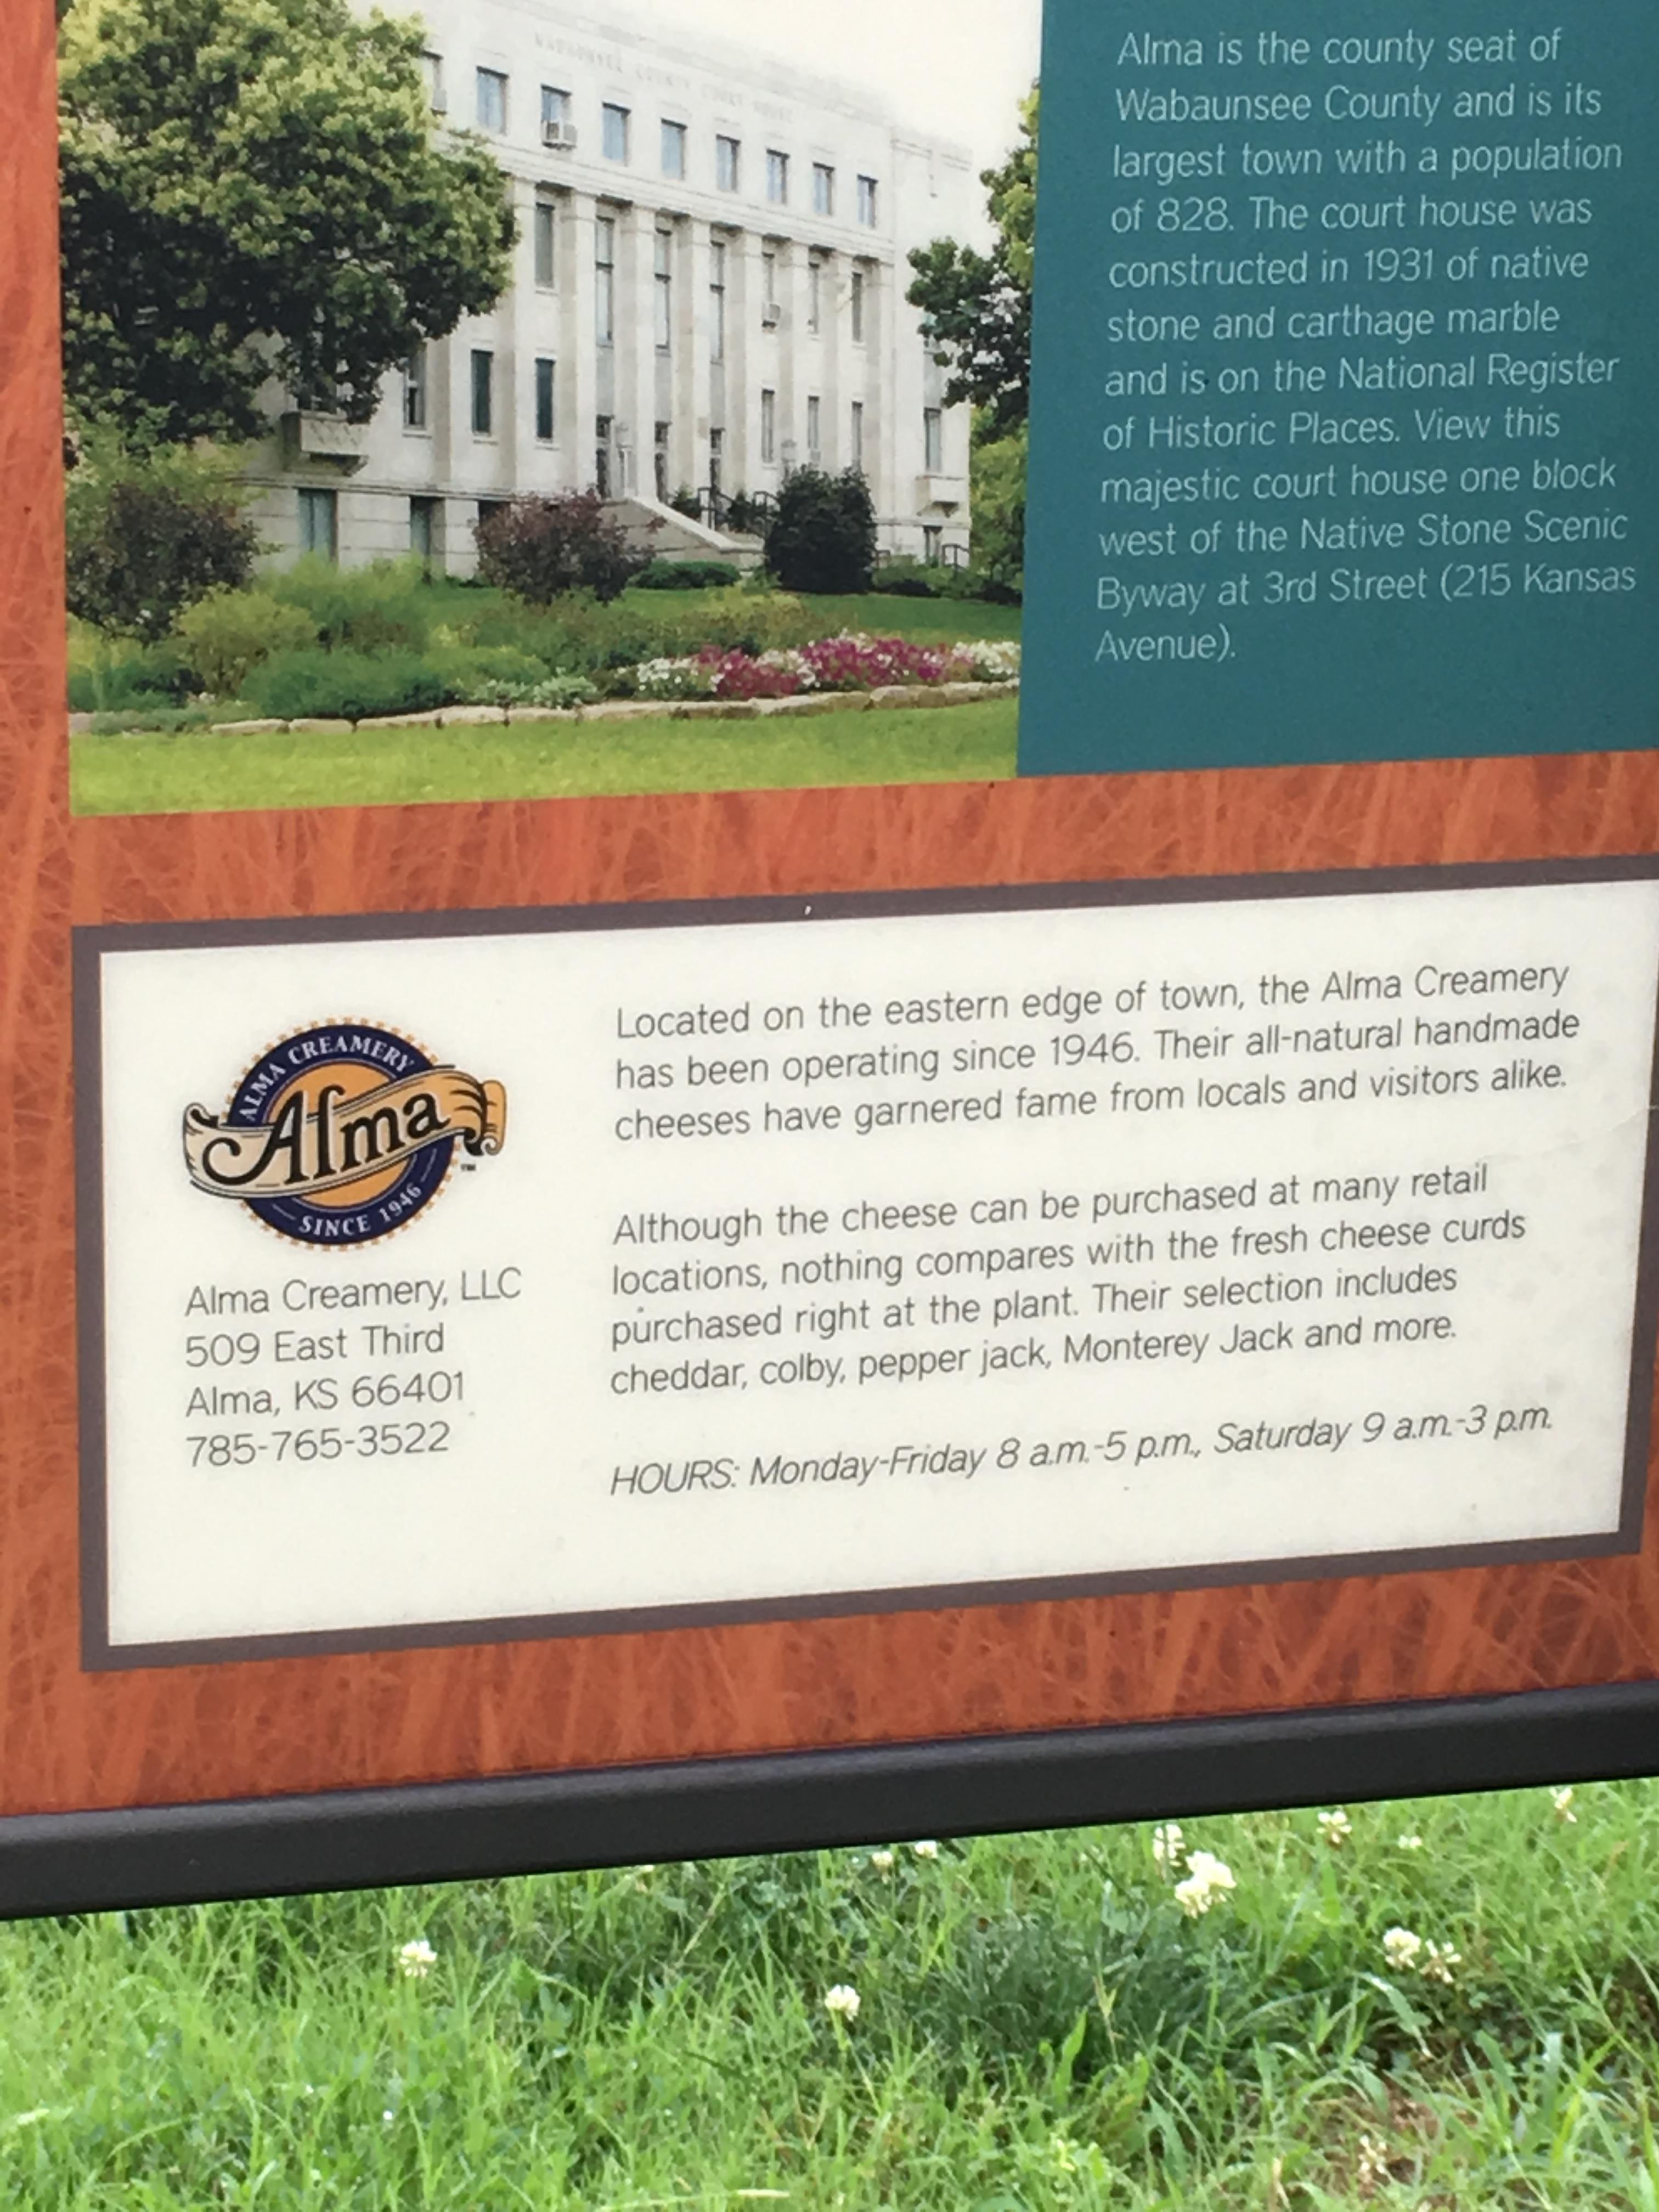 Alma Creamery Information